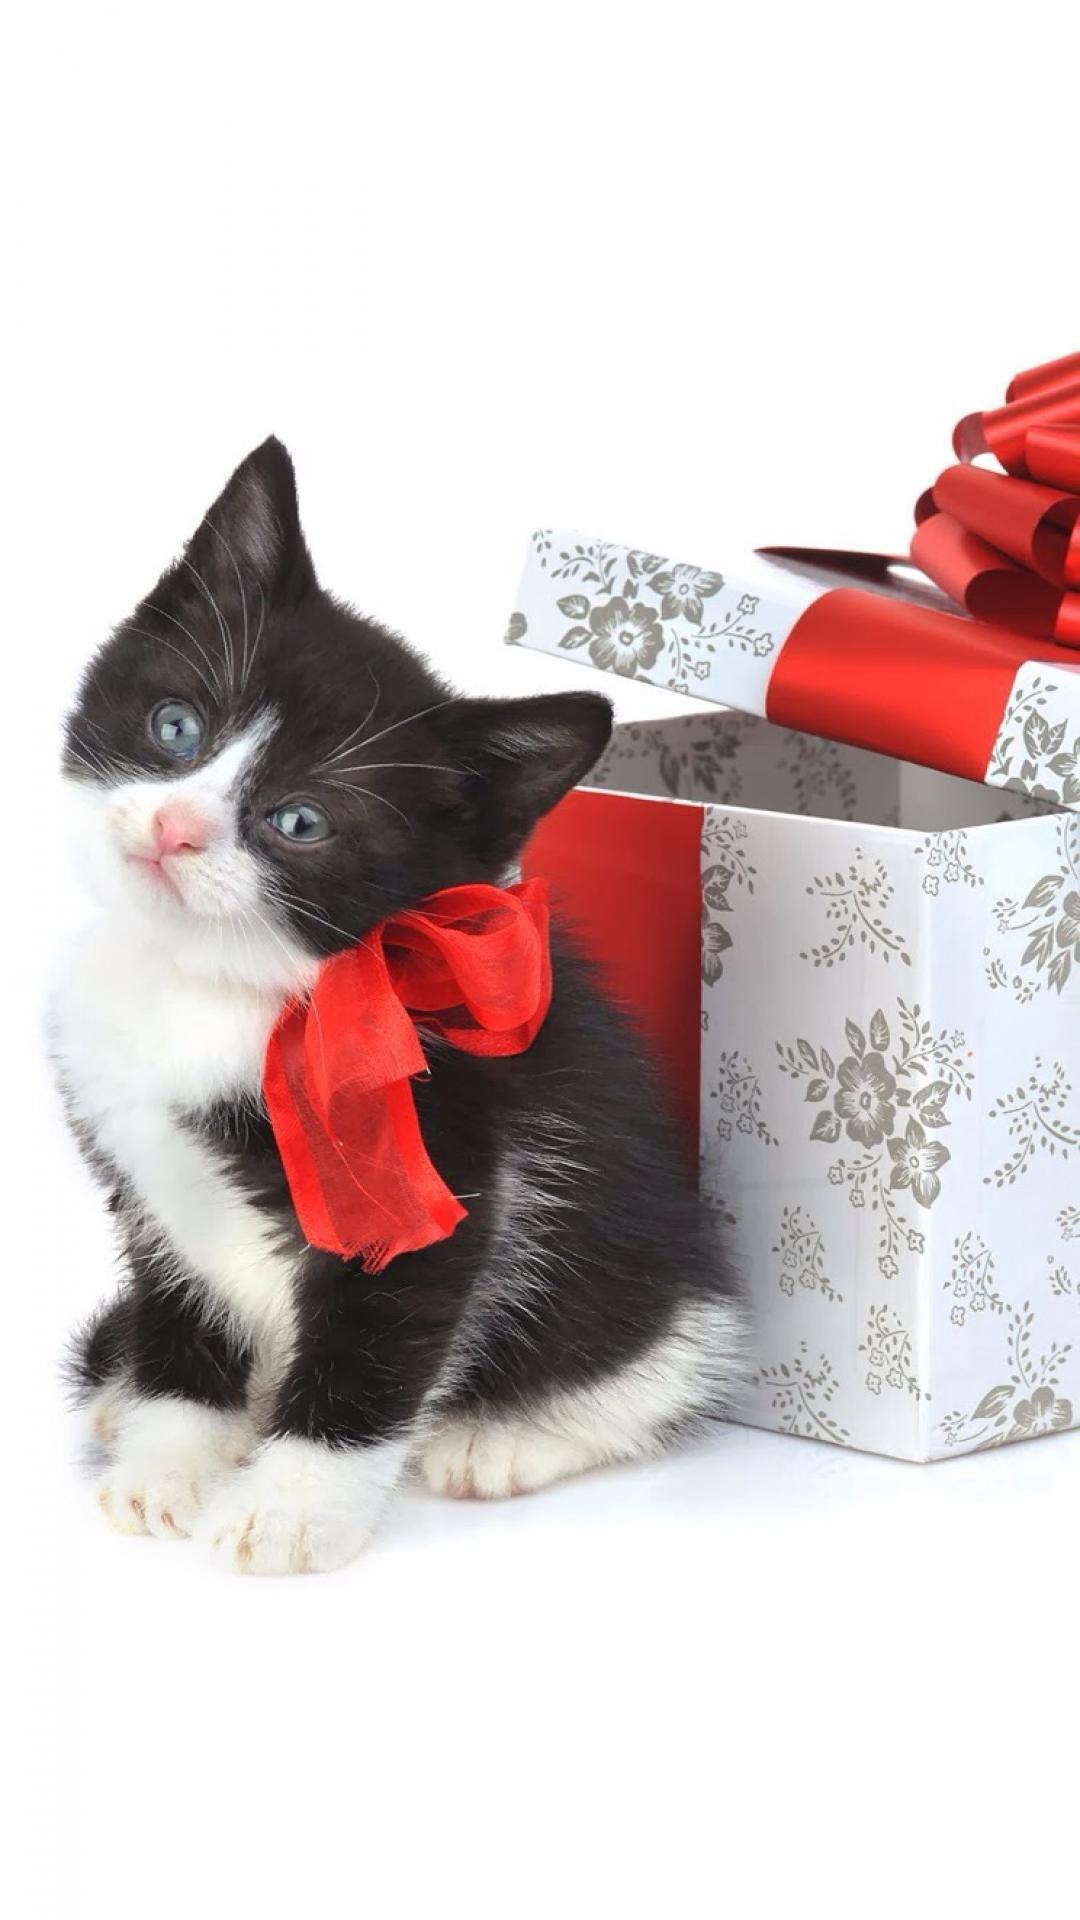 Christmas Kitten Present iPhone 6 wallpaper | Christmas Wallpaper ...